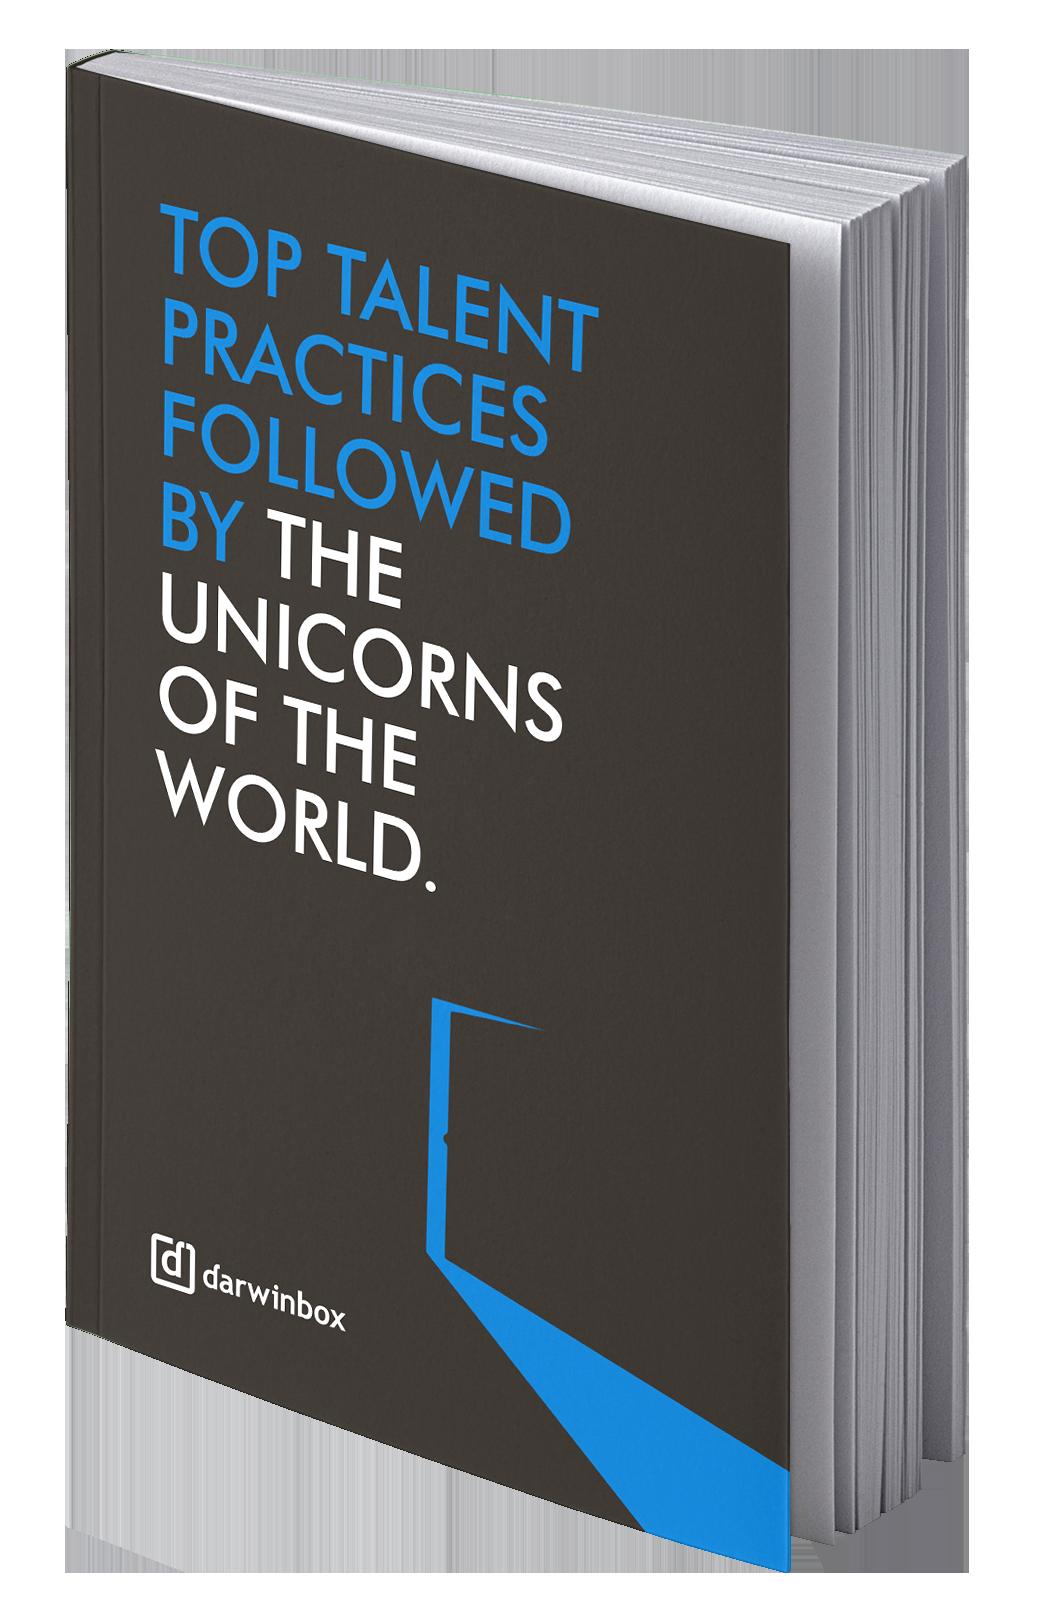 Top Practices By Unicorns_Ebook_Mockup1